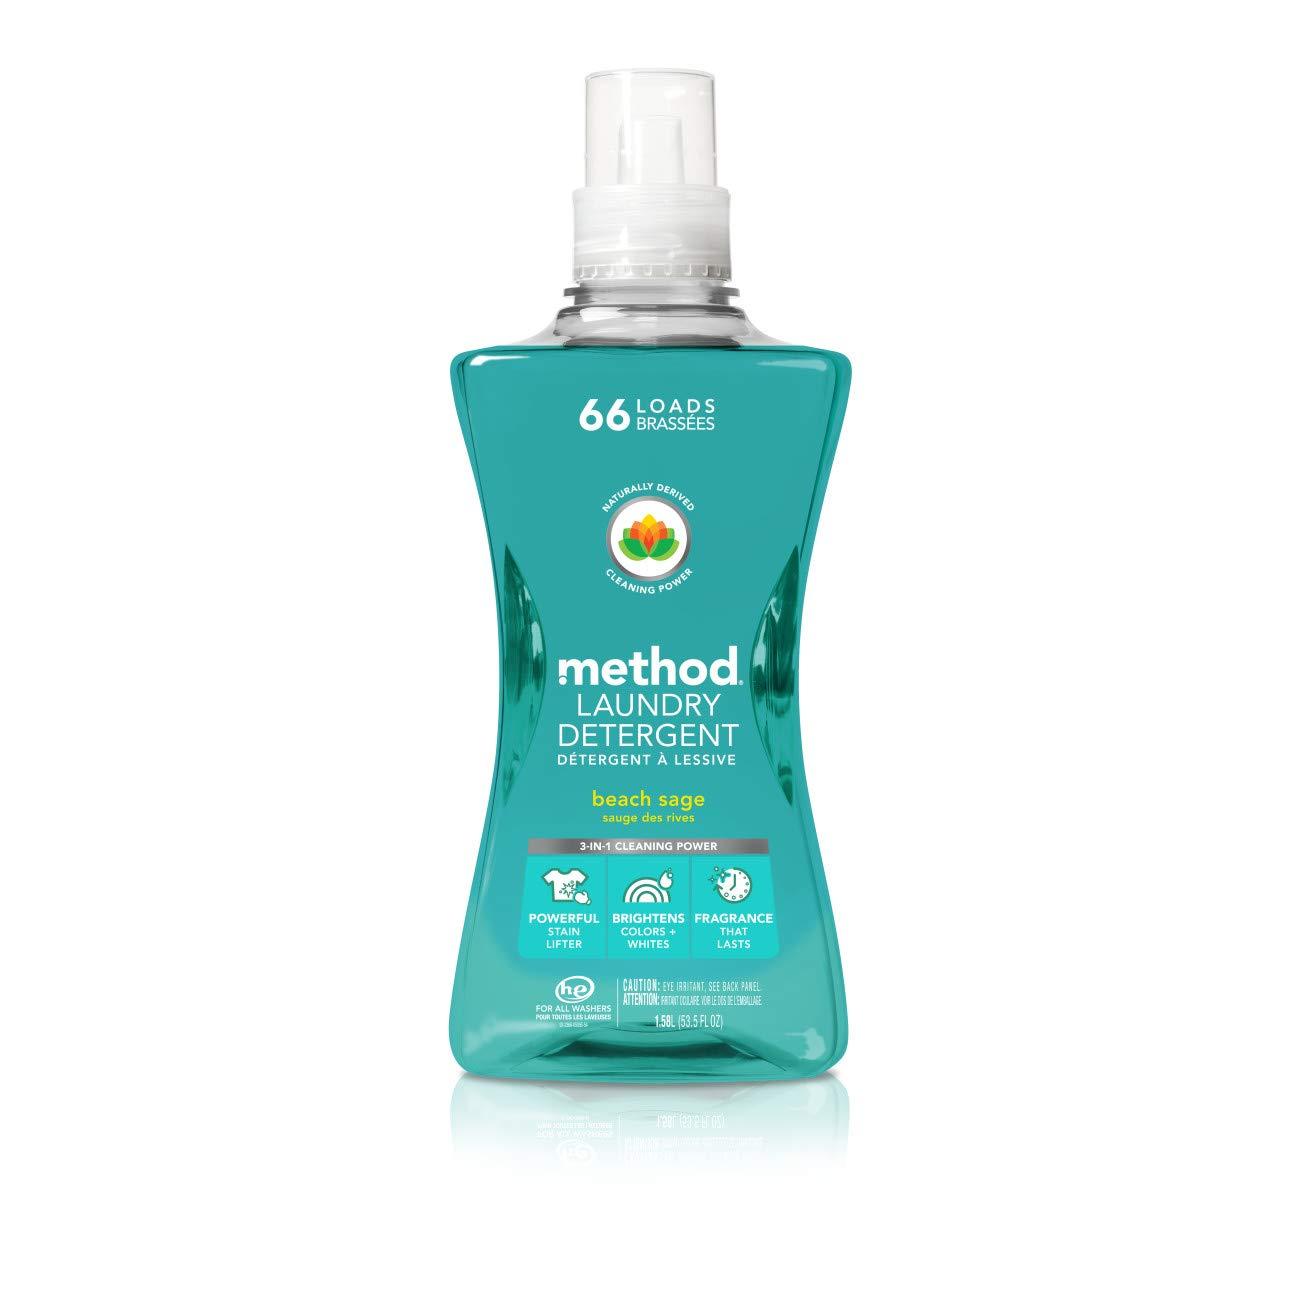 Method Laundry Detergent, Beach Sage, 53.5 Ounces, 66 Loads (2 Pack)